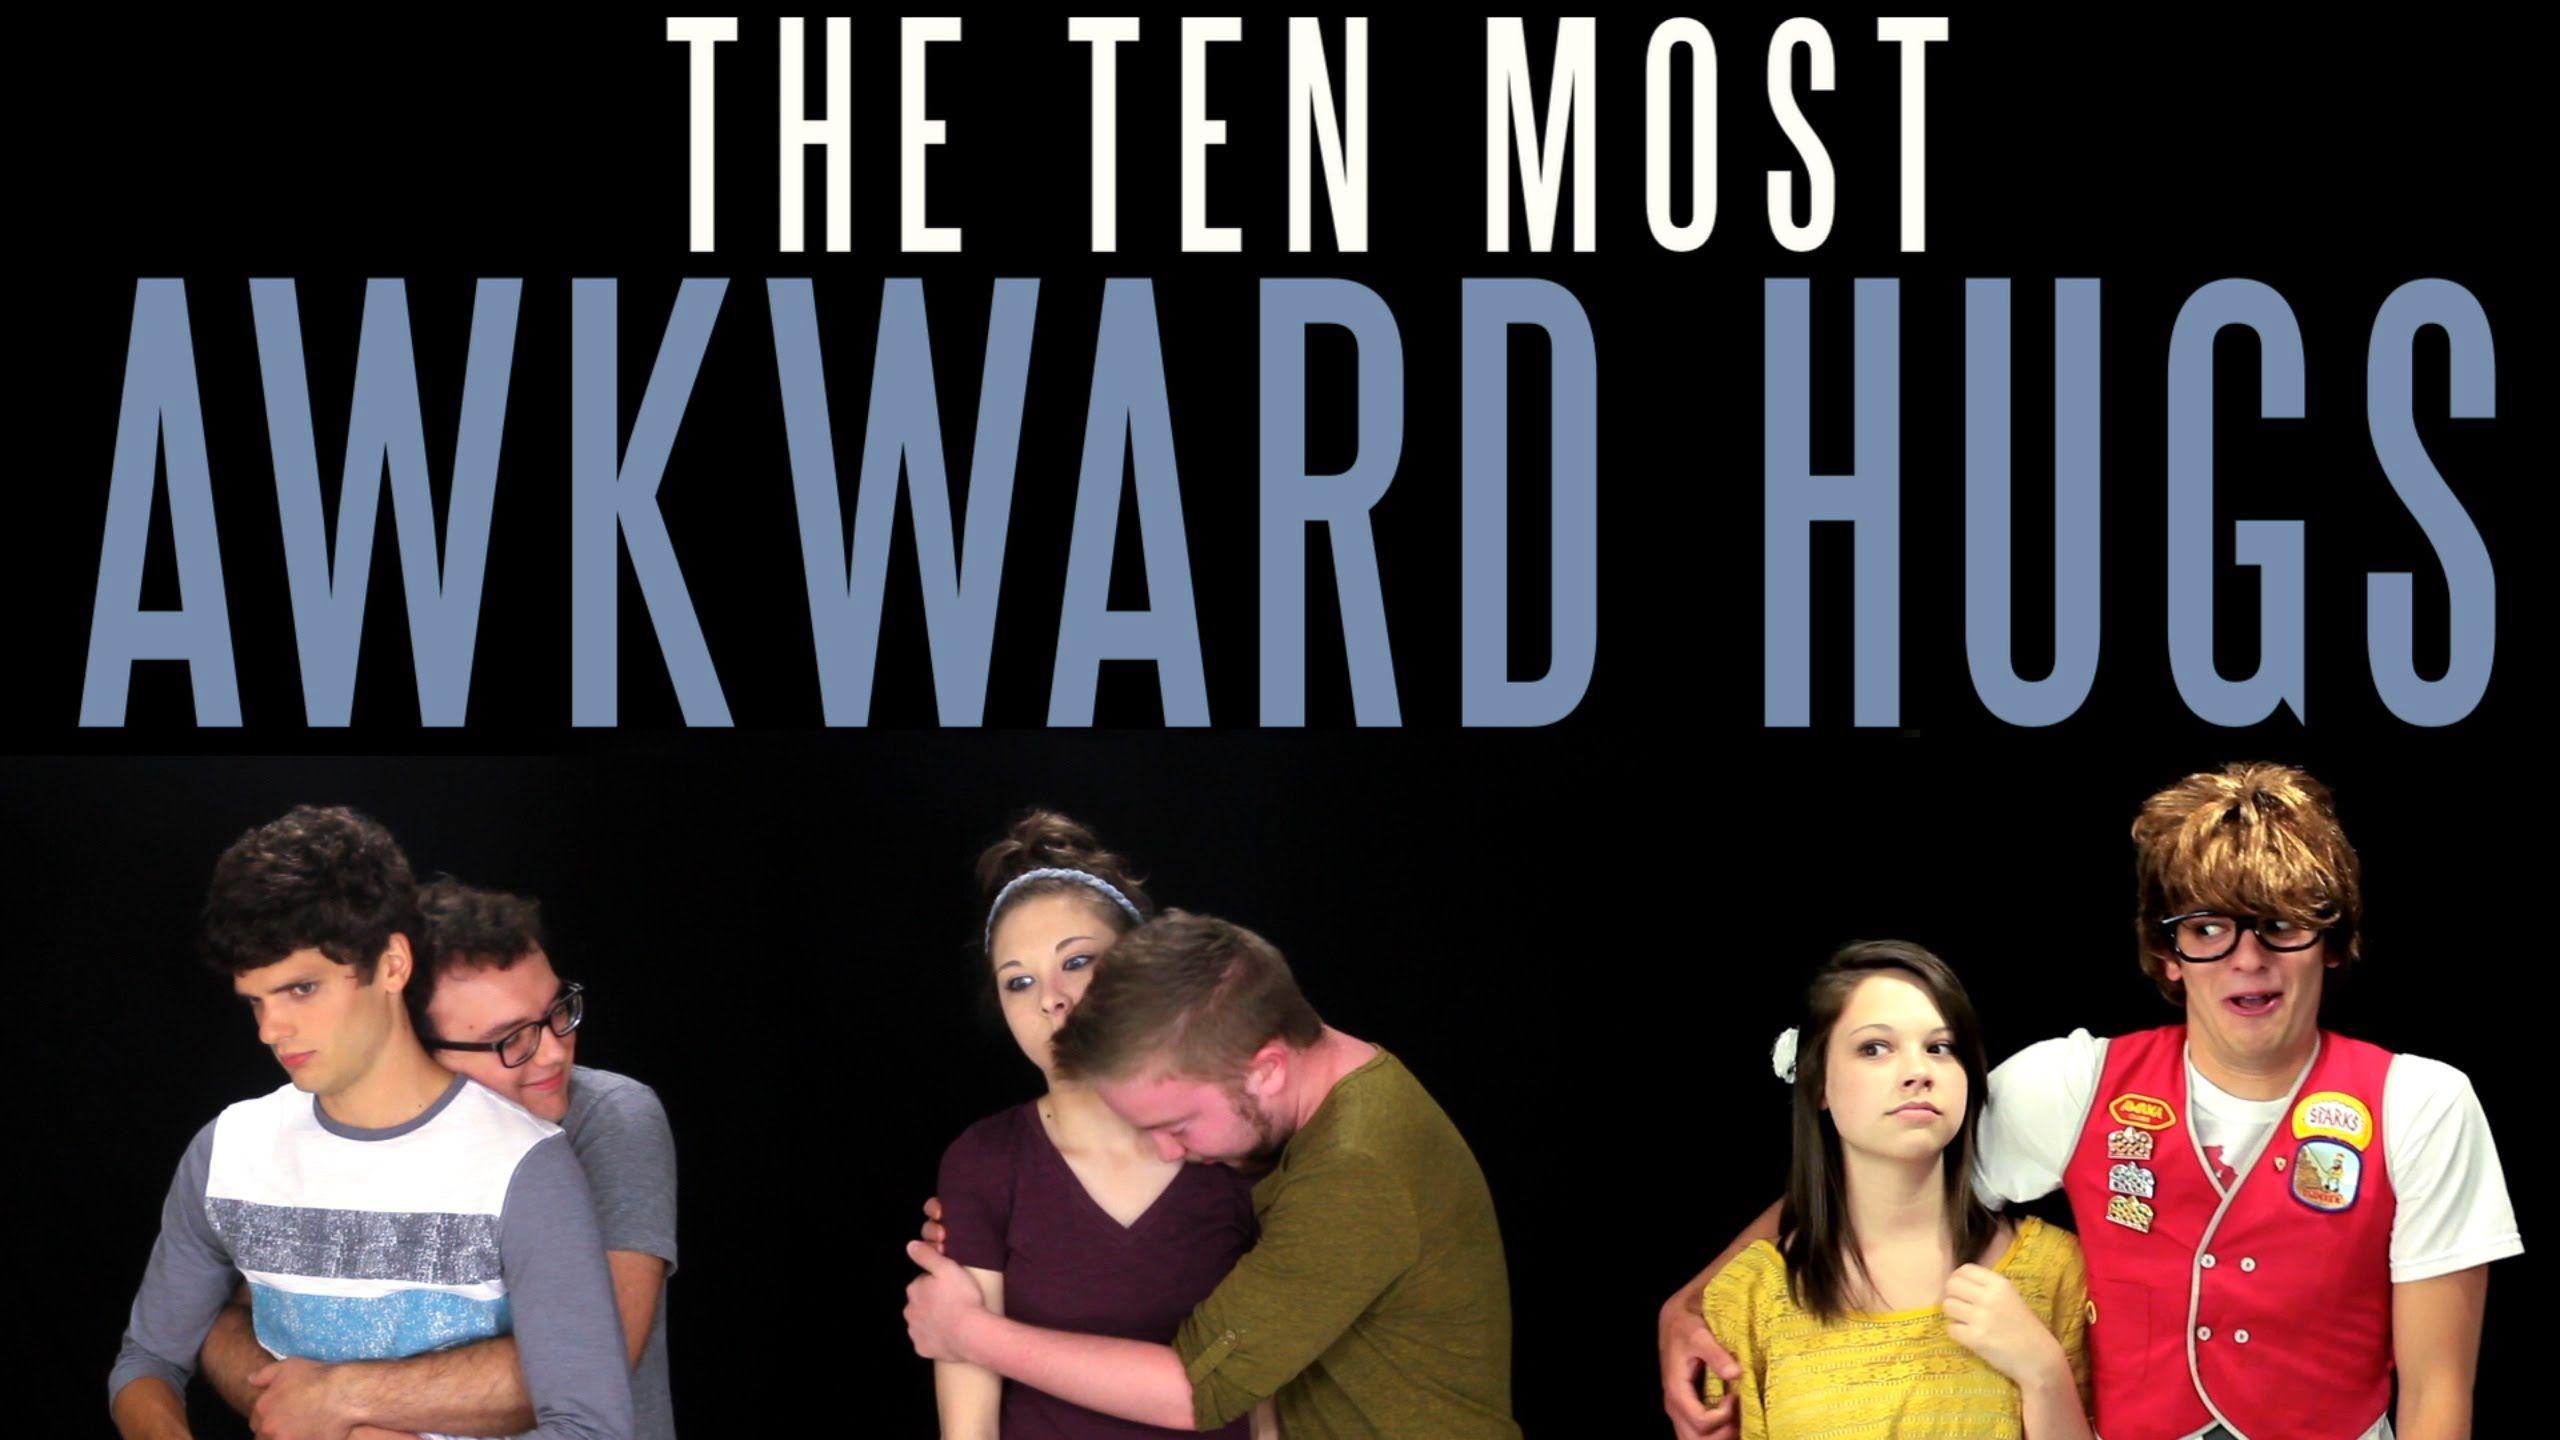 The Ten Most Awkward Hugs Messy Mondays Awkward hug